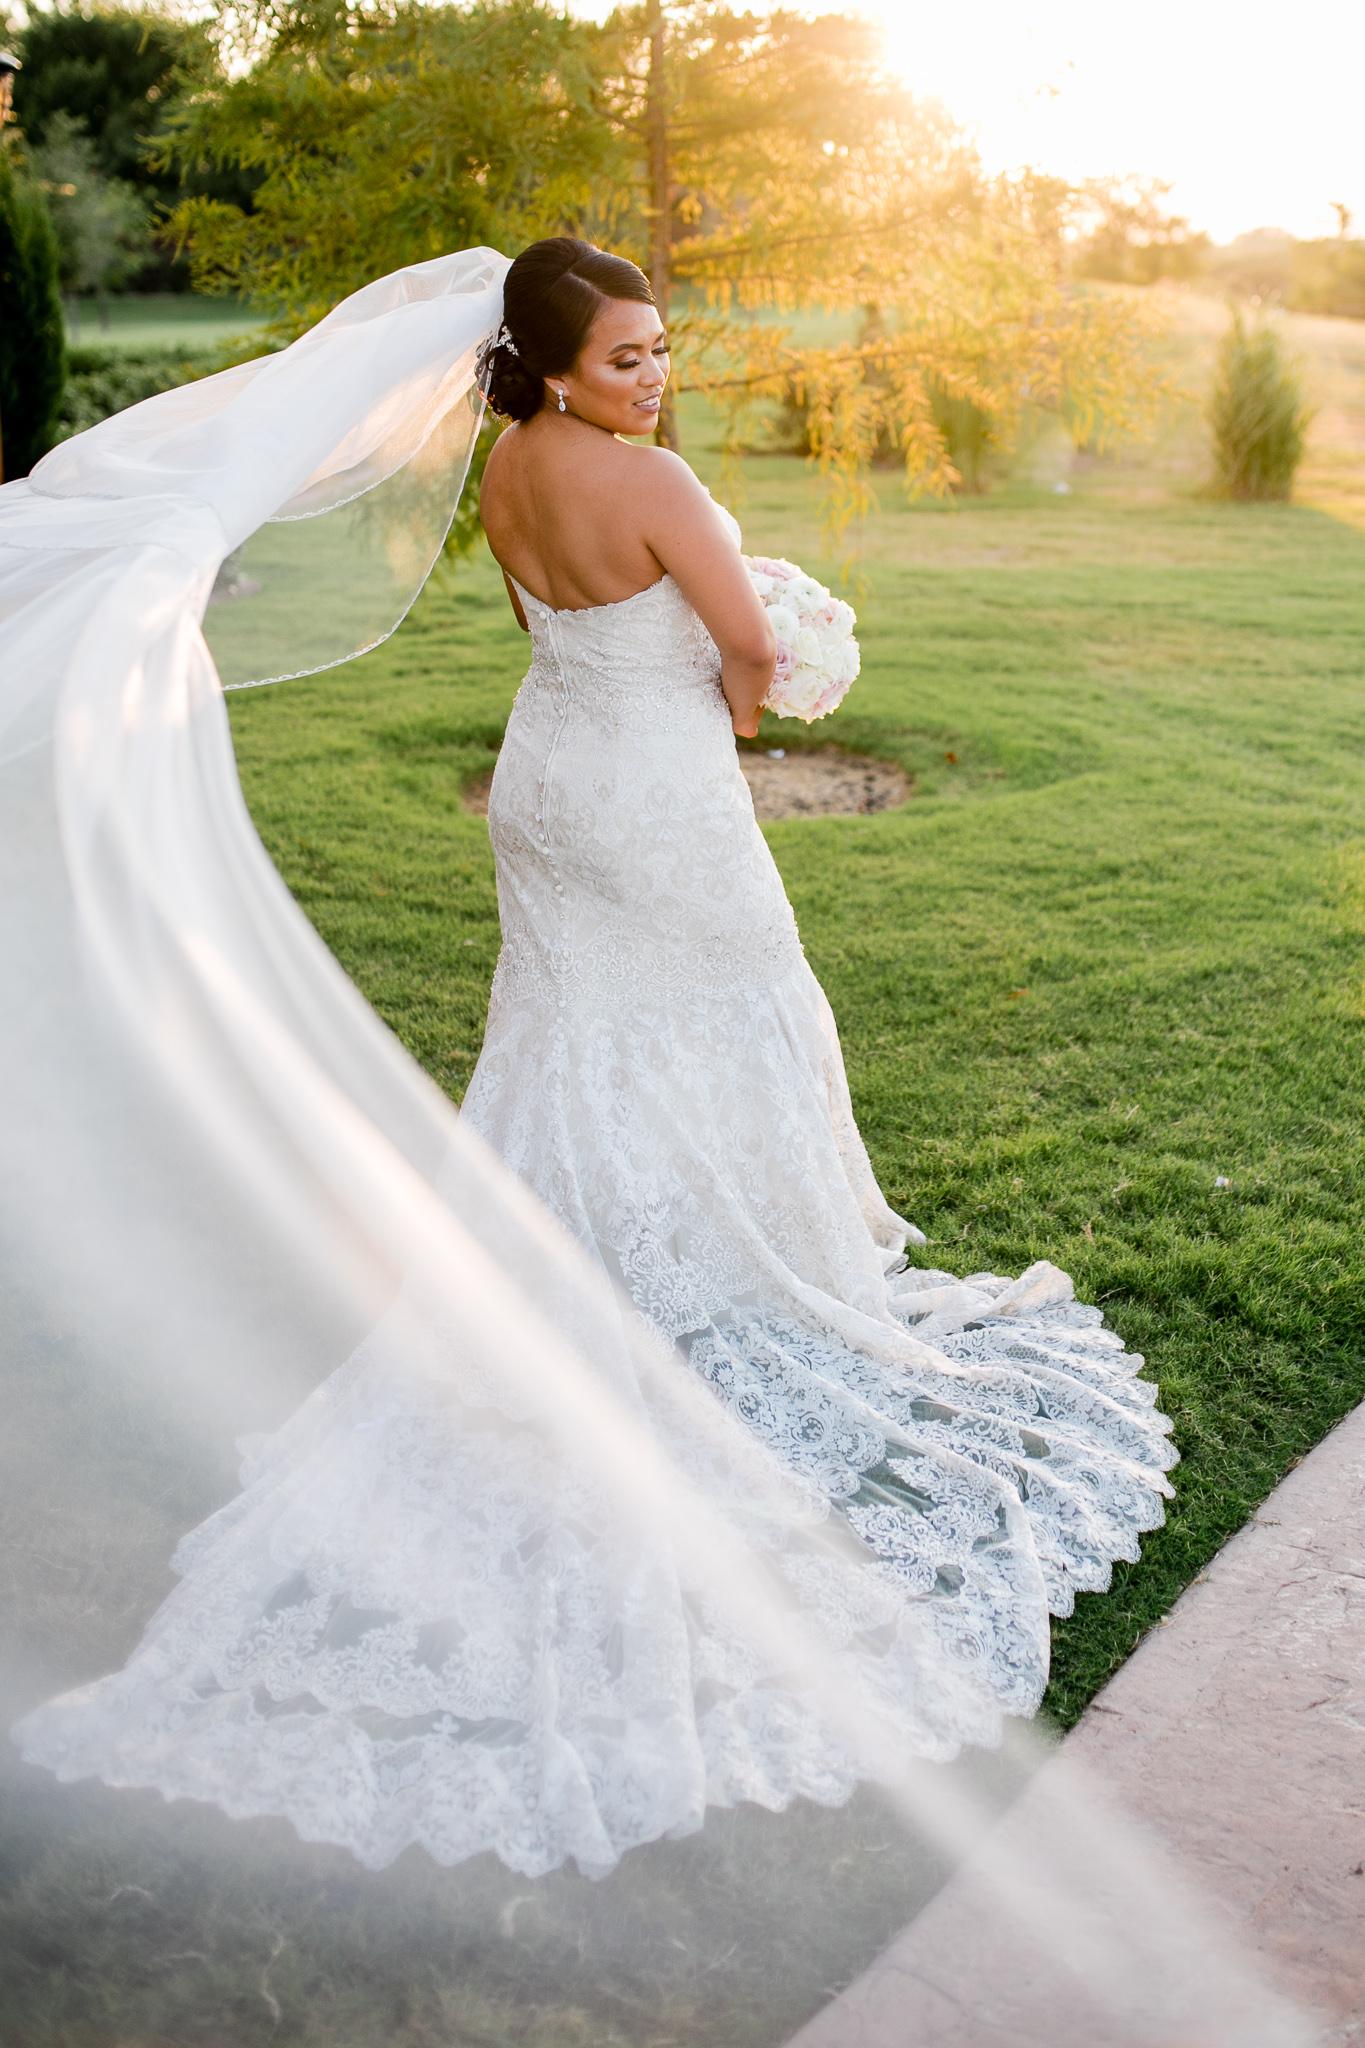 Leir Dor Lux Brides